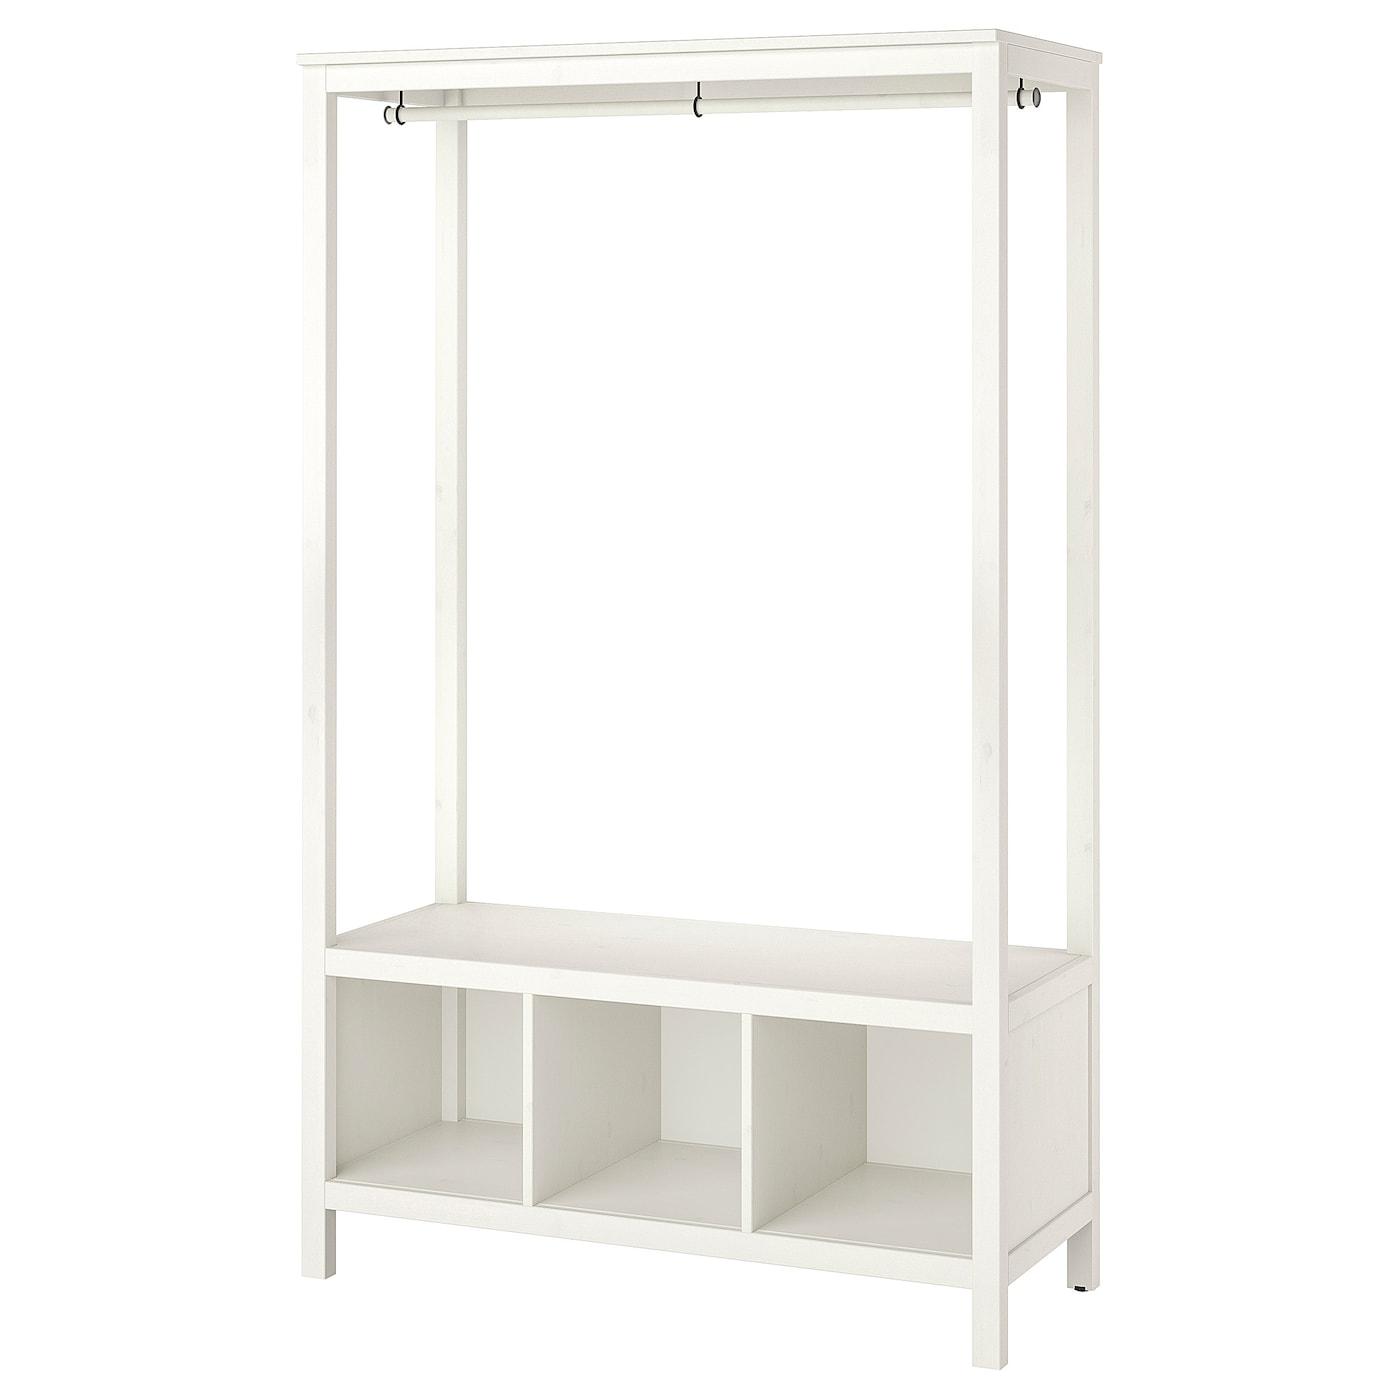 hemnes armoire ouverte teinté blanc 120 x 50 x 197 cm - ikea